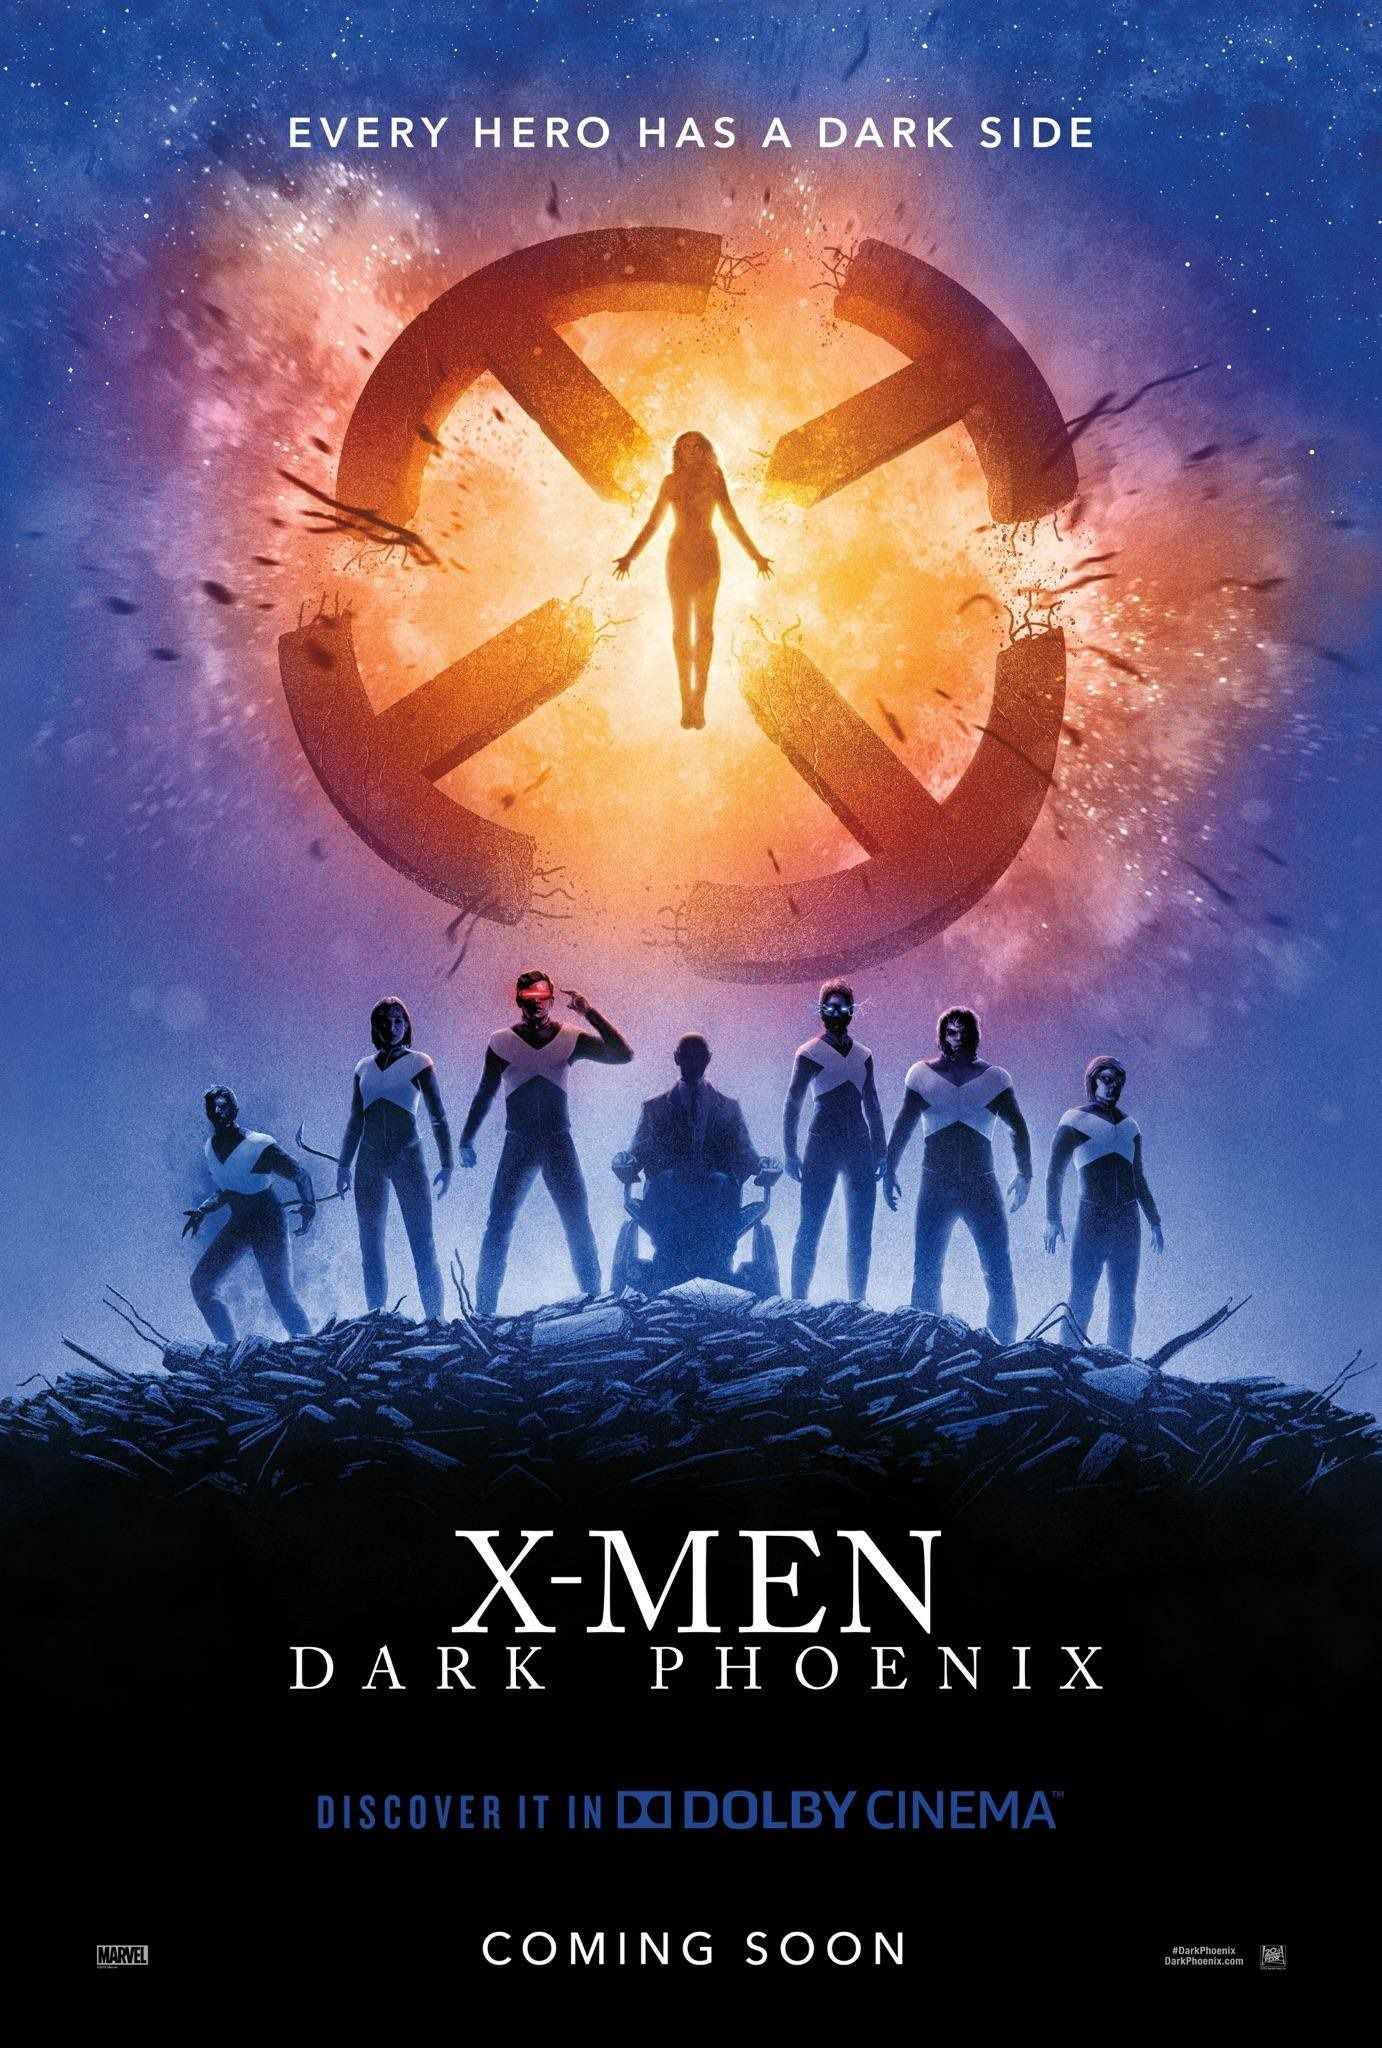 X Men Dark Phoenix Ending Completely Reshot Due To Parallels With Another Superhero Movie Dark Phoenix X Men Movie Posters